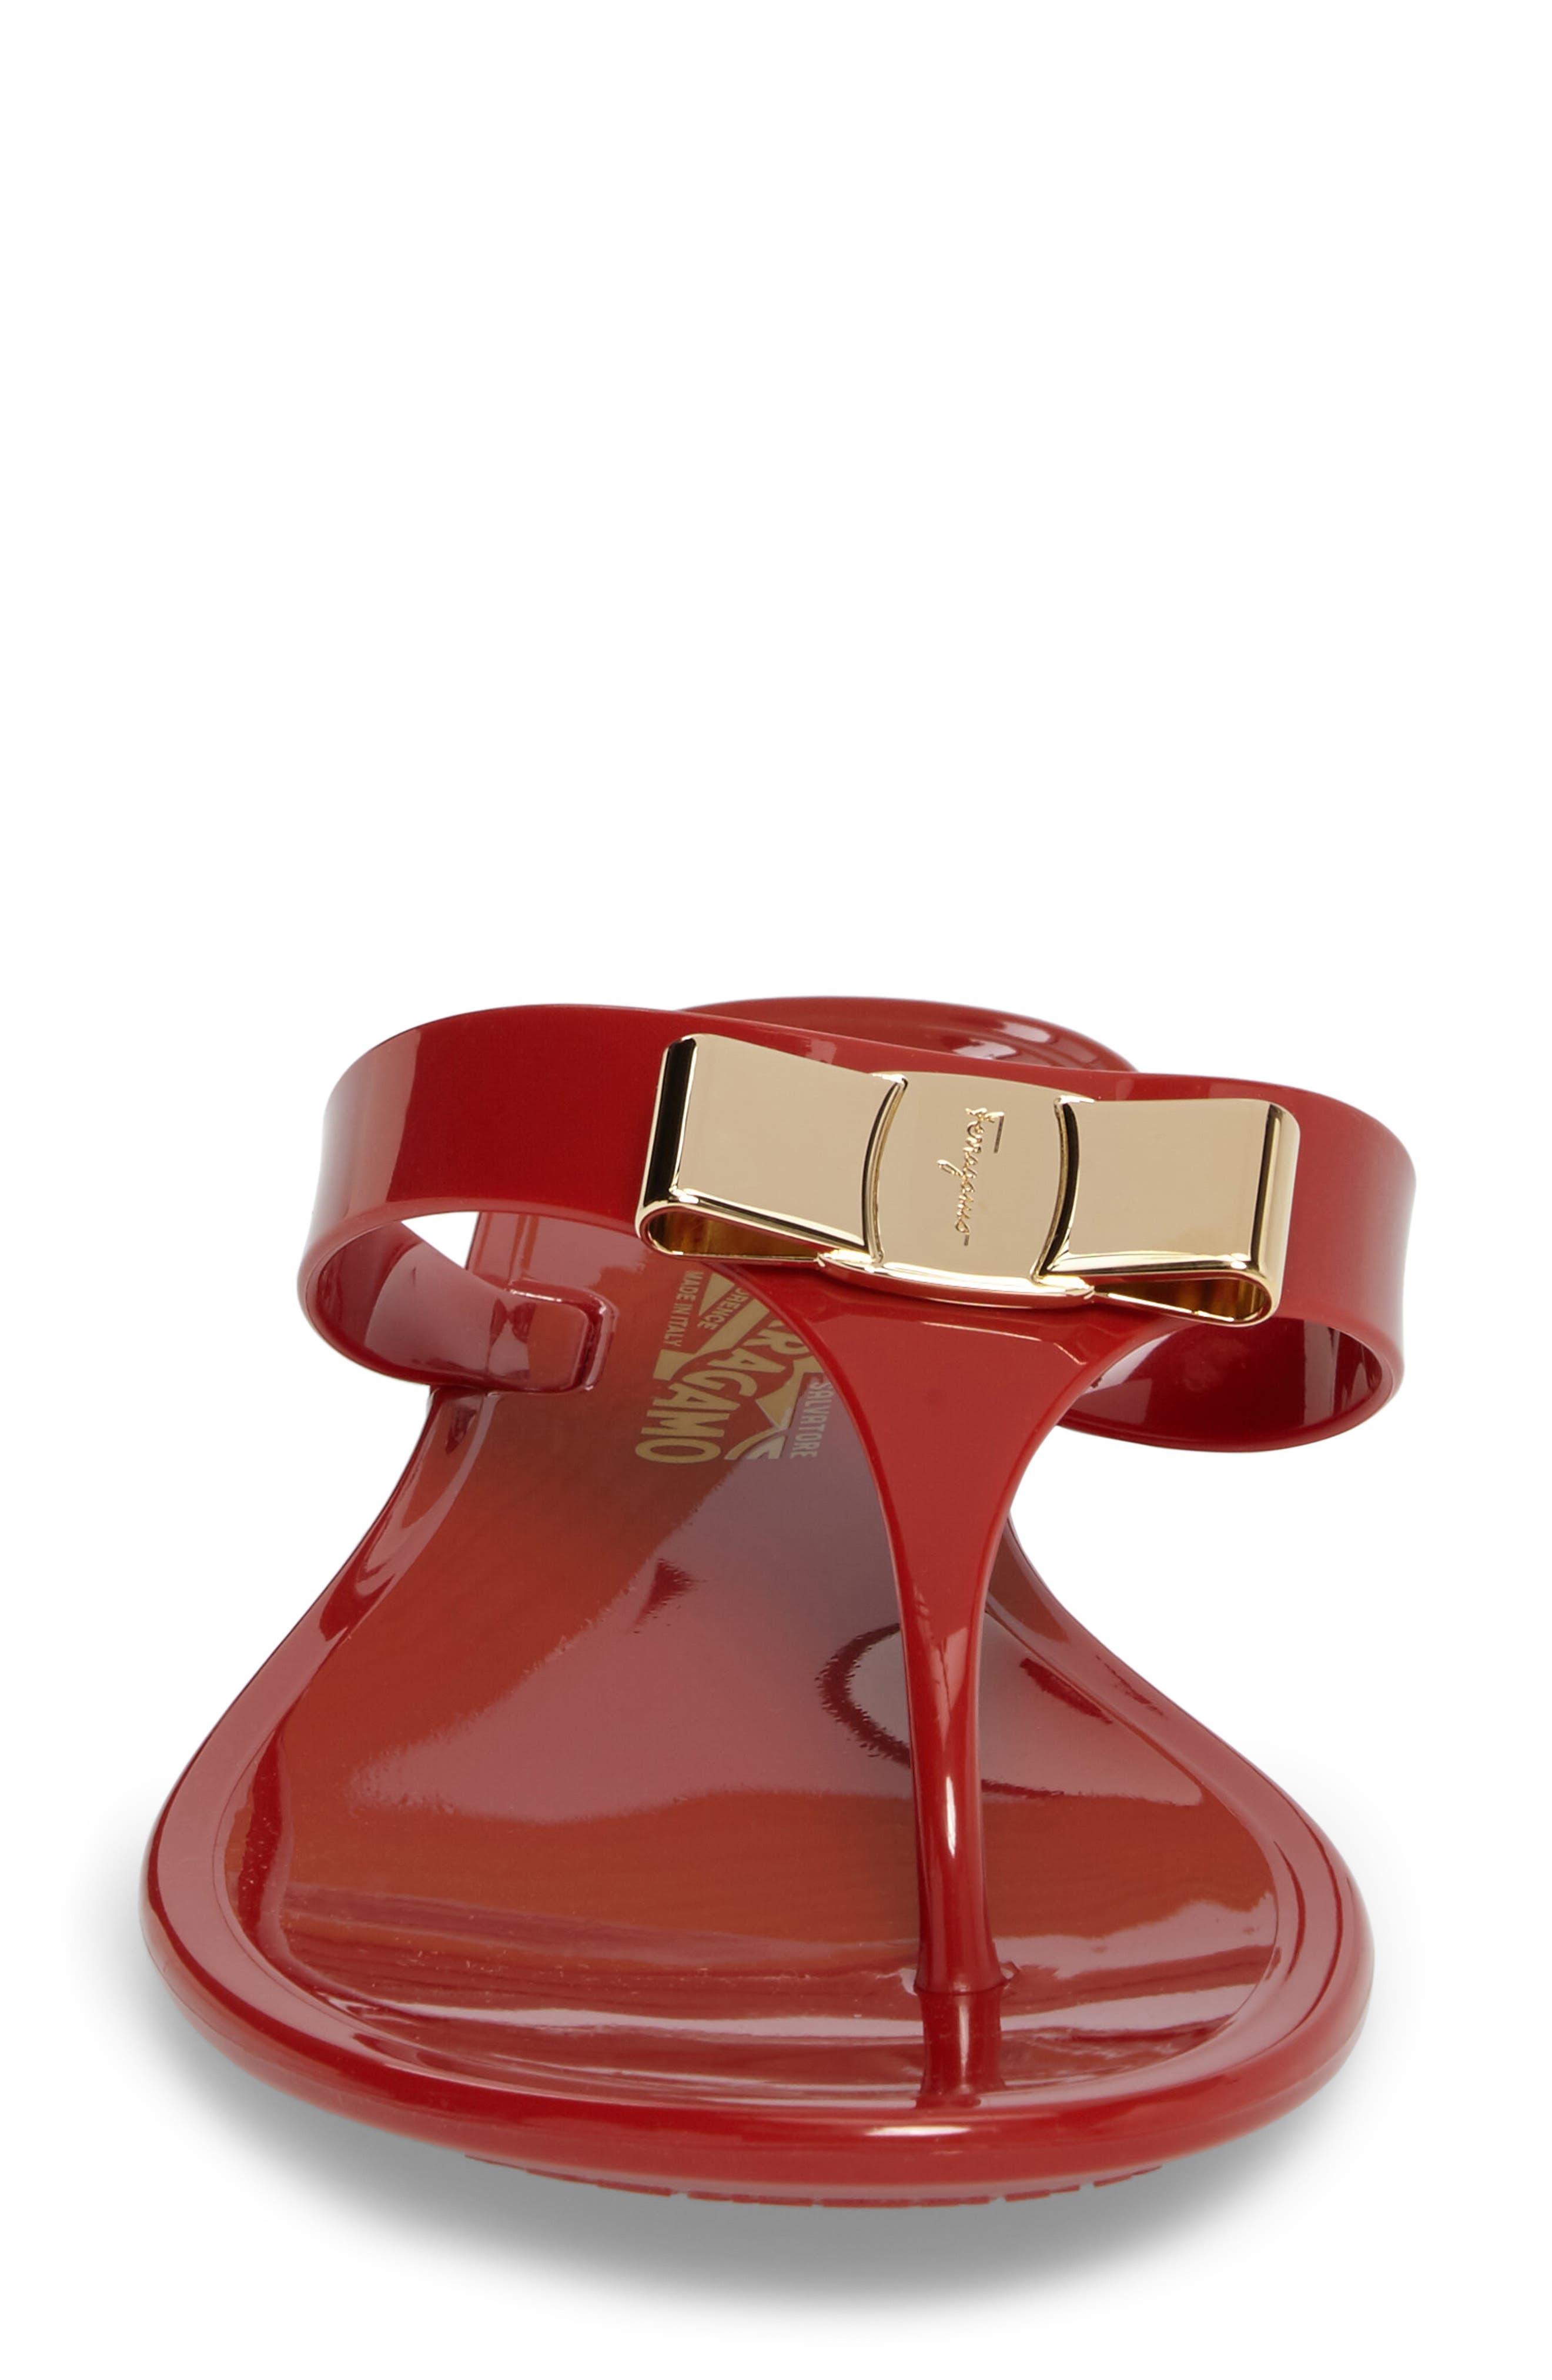 Farelia Jelly Flat Bow Sandal,                             Alternate thumbnail 4, color,                             Red Pvc